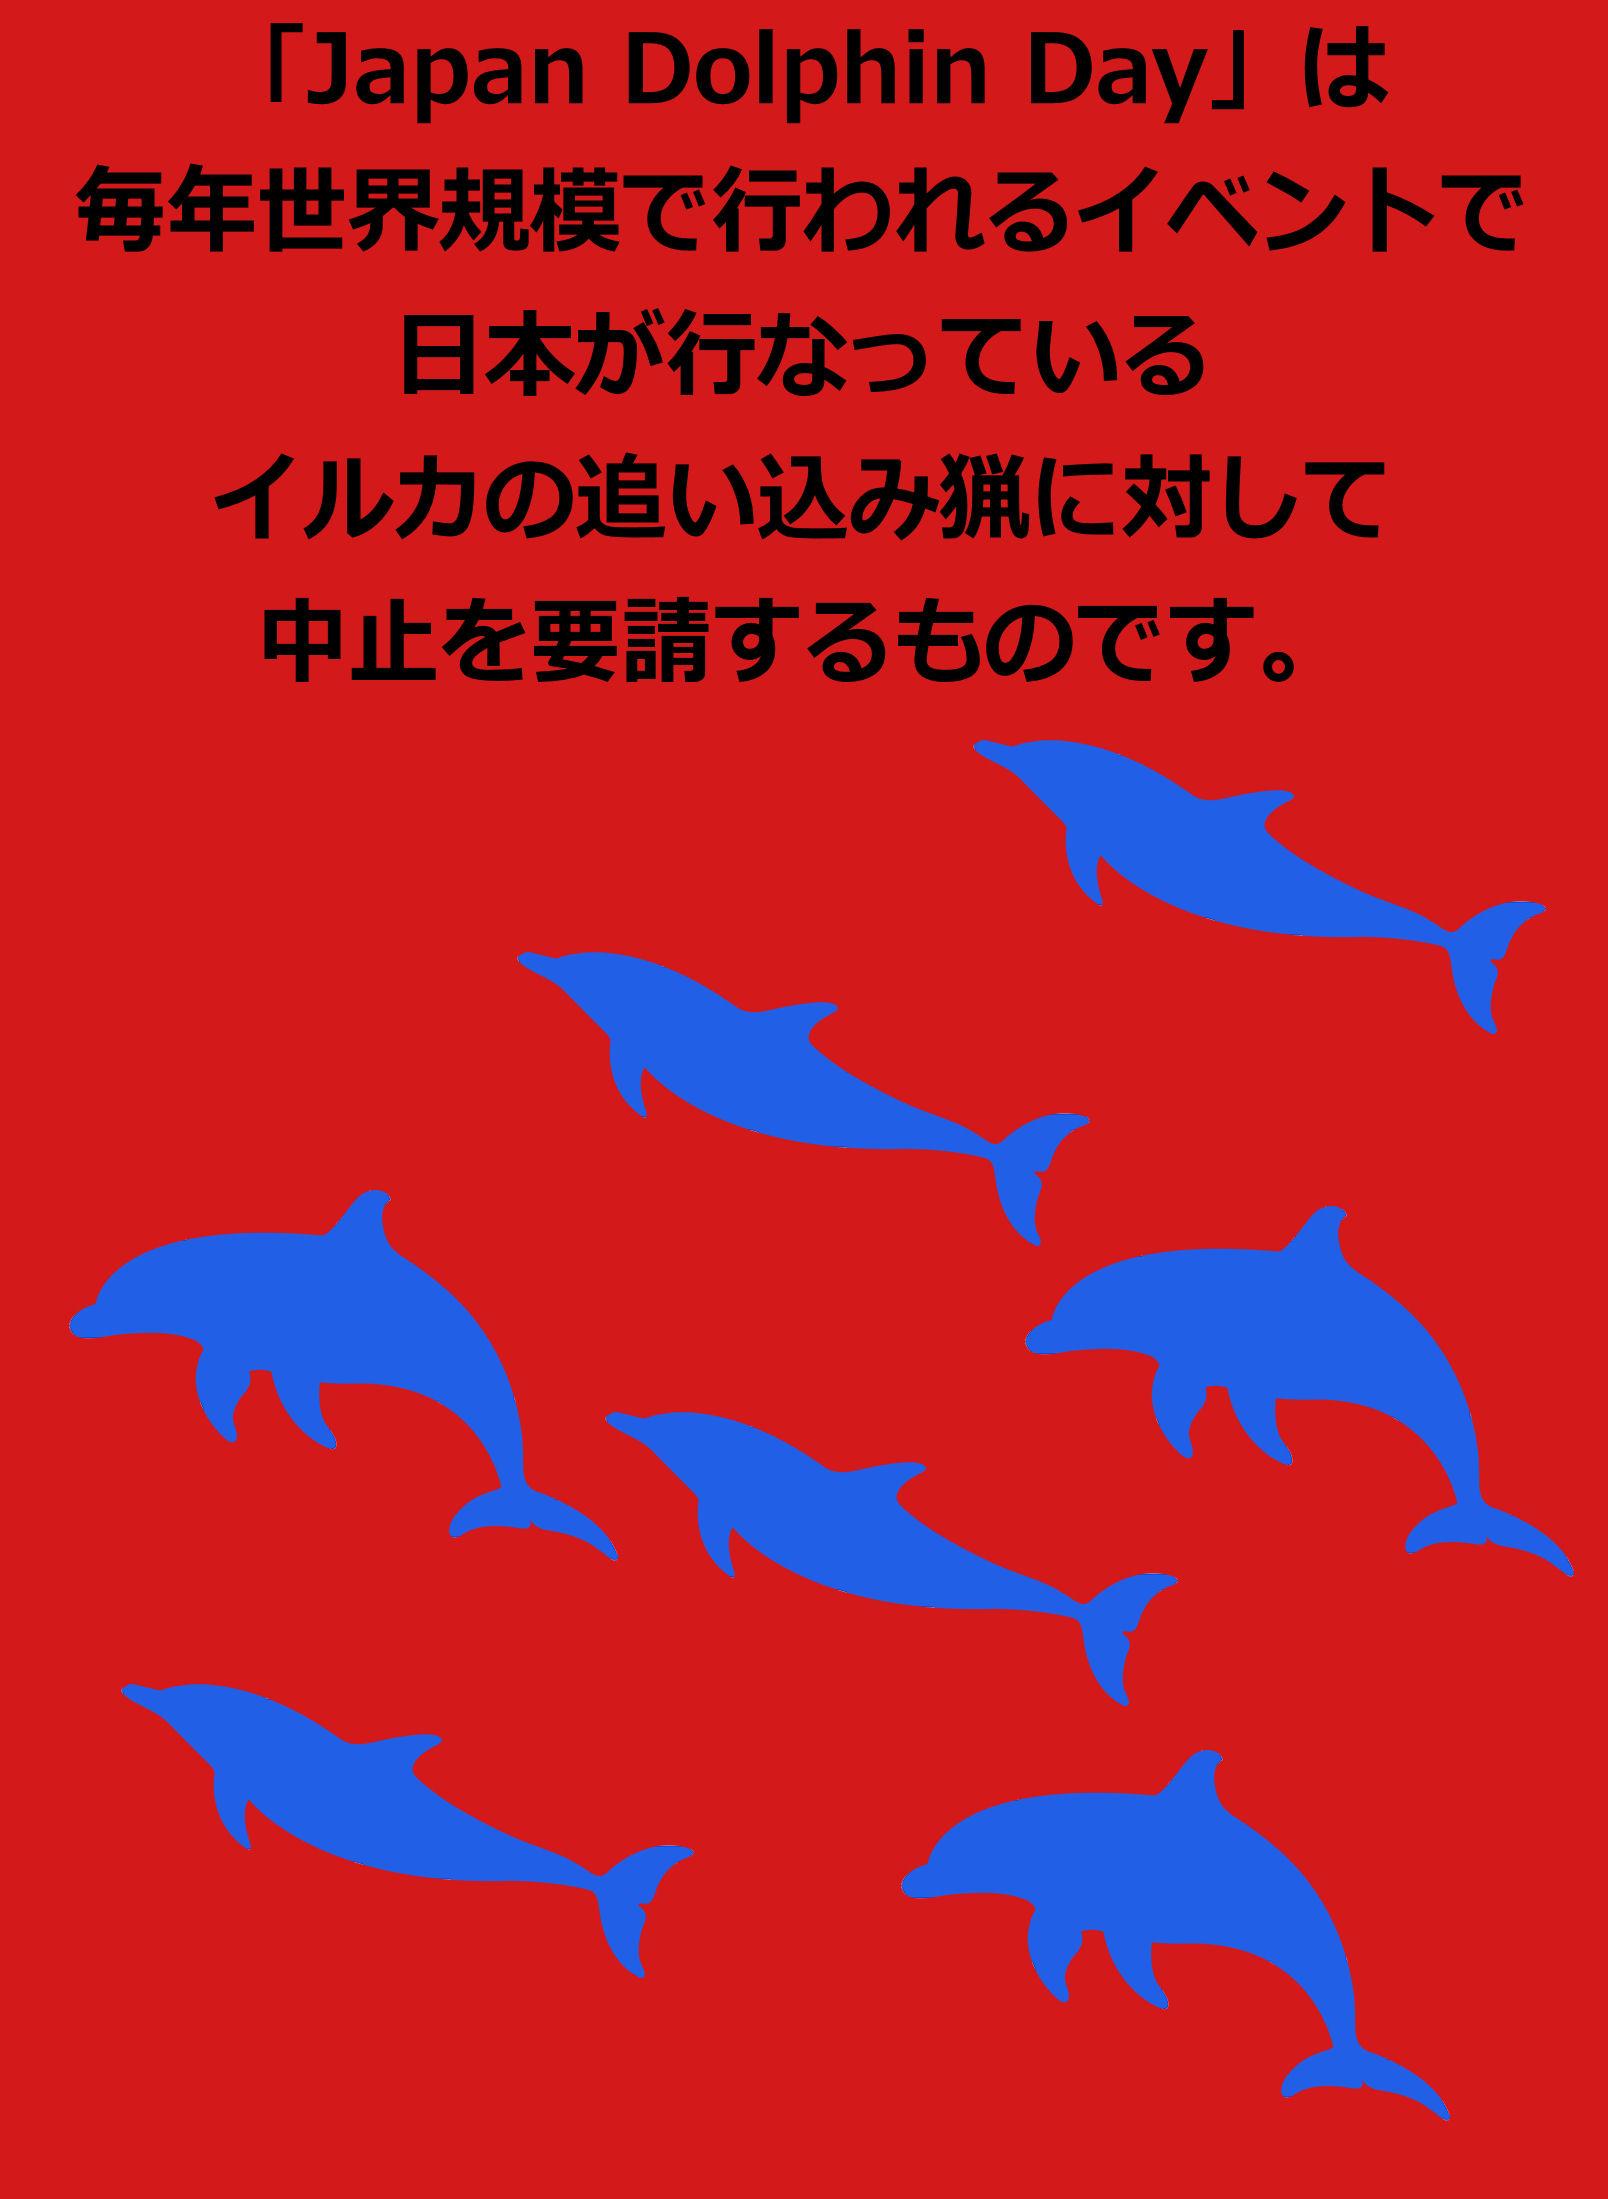 japandolphinsday3.jpg